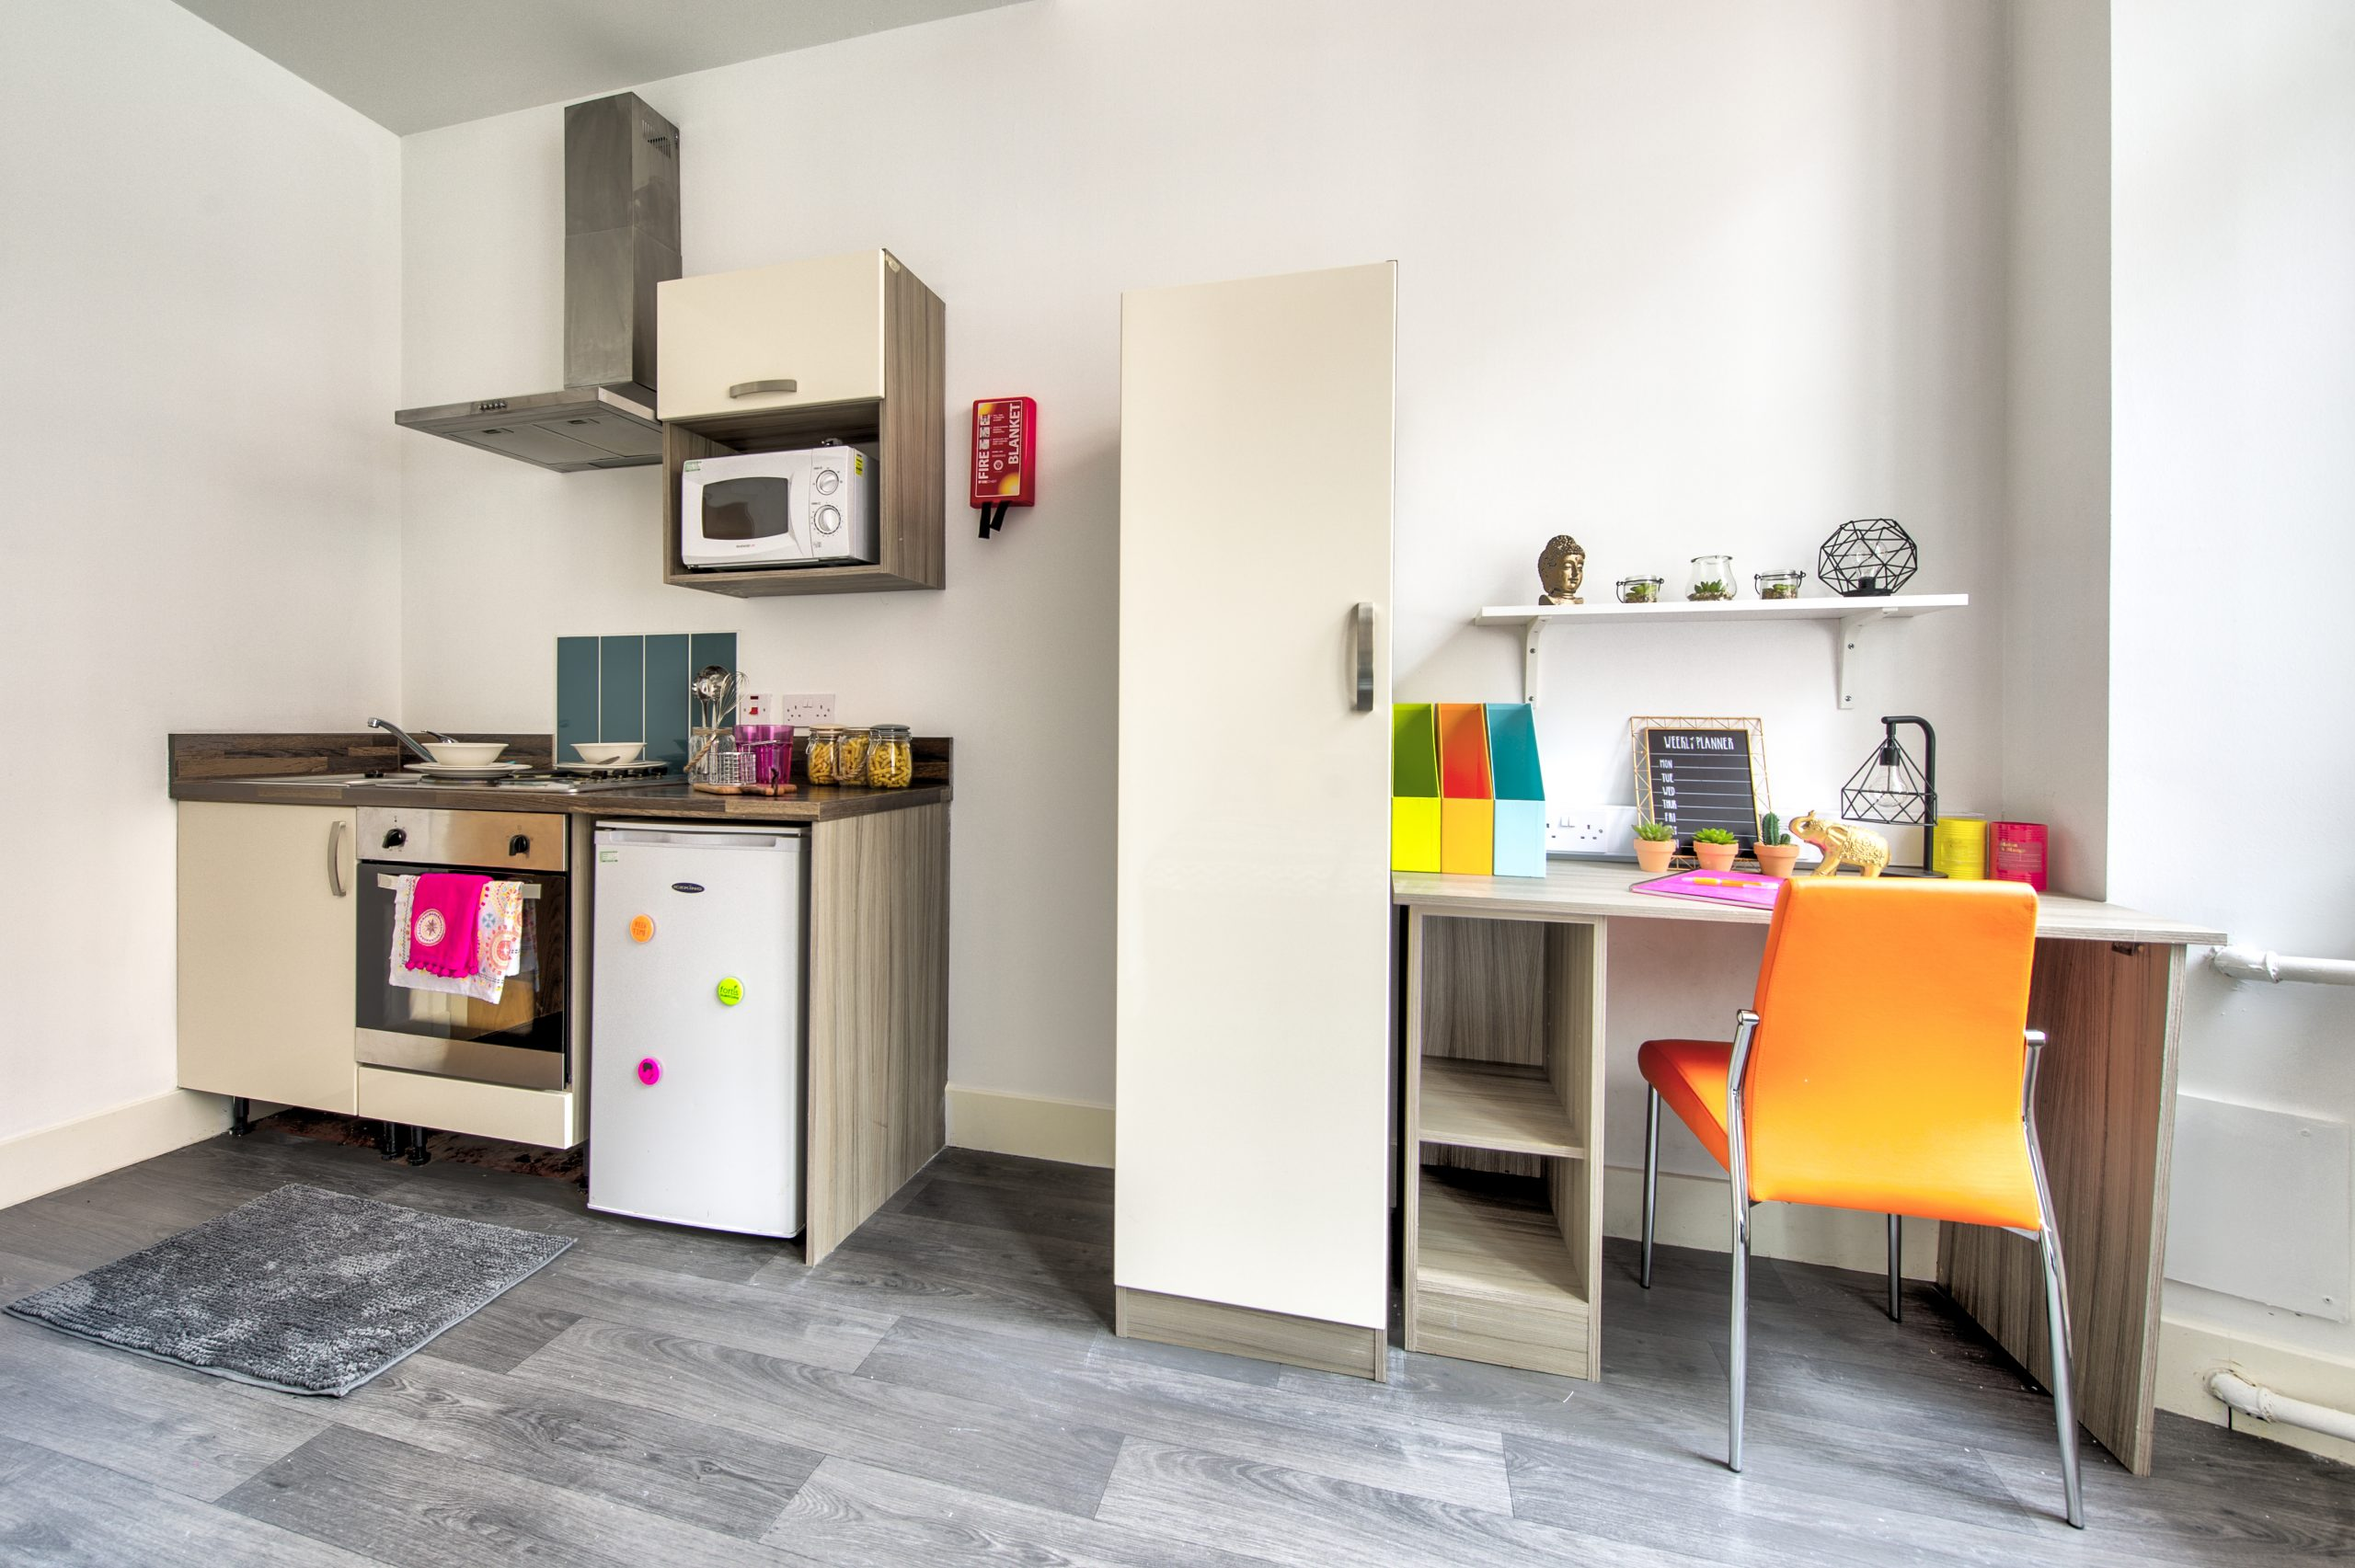 desk and kitchen area in studio apartment